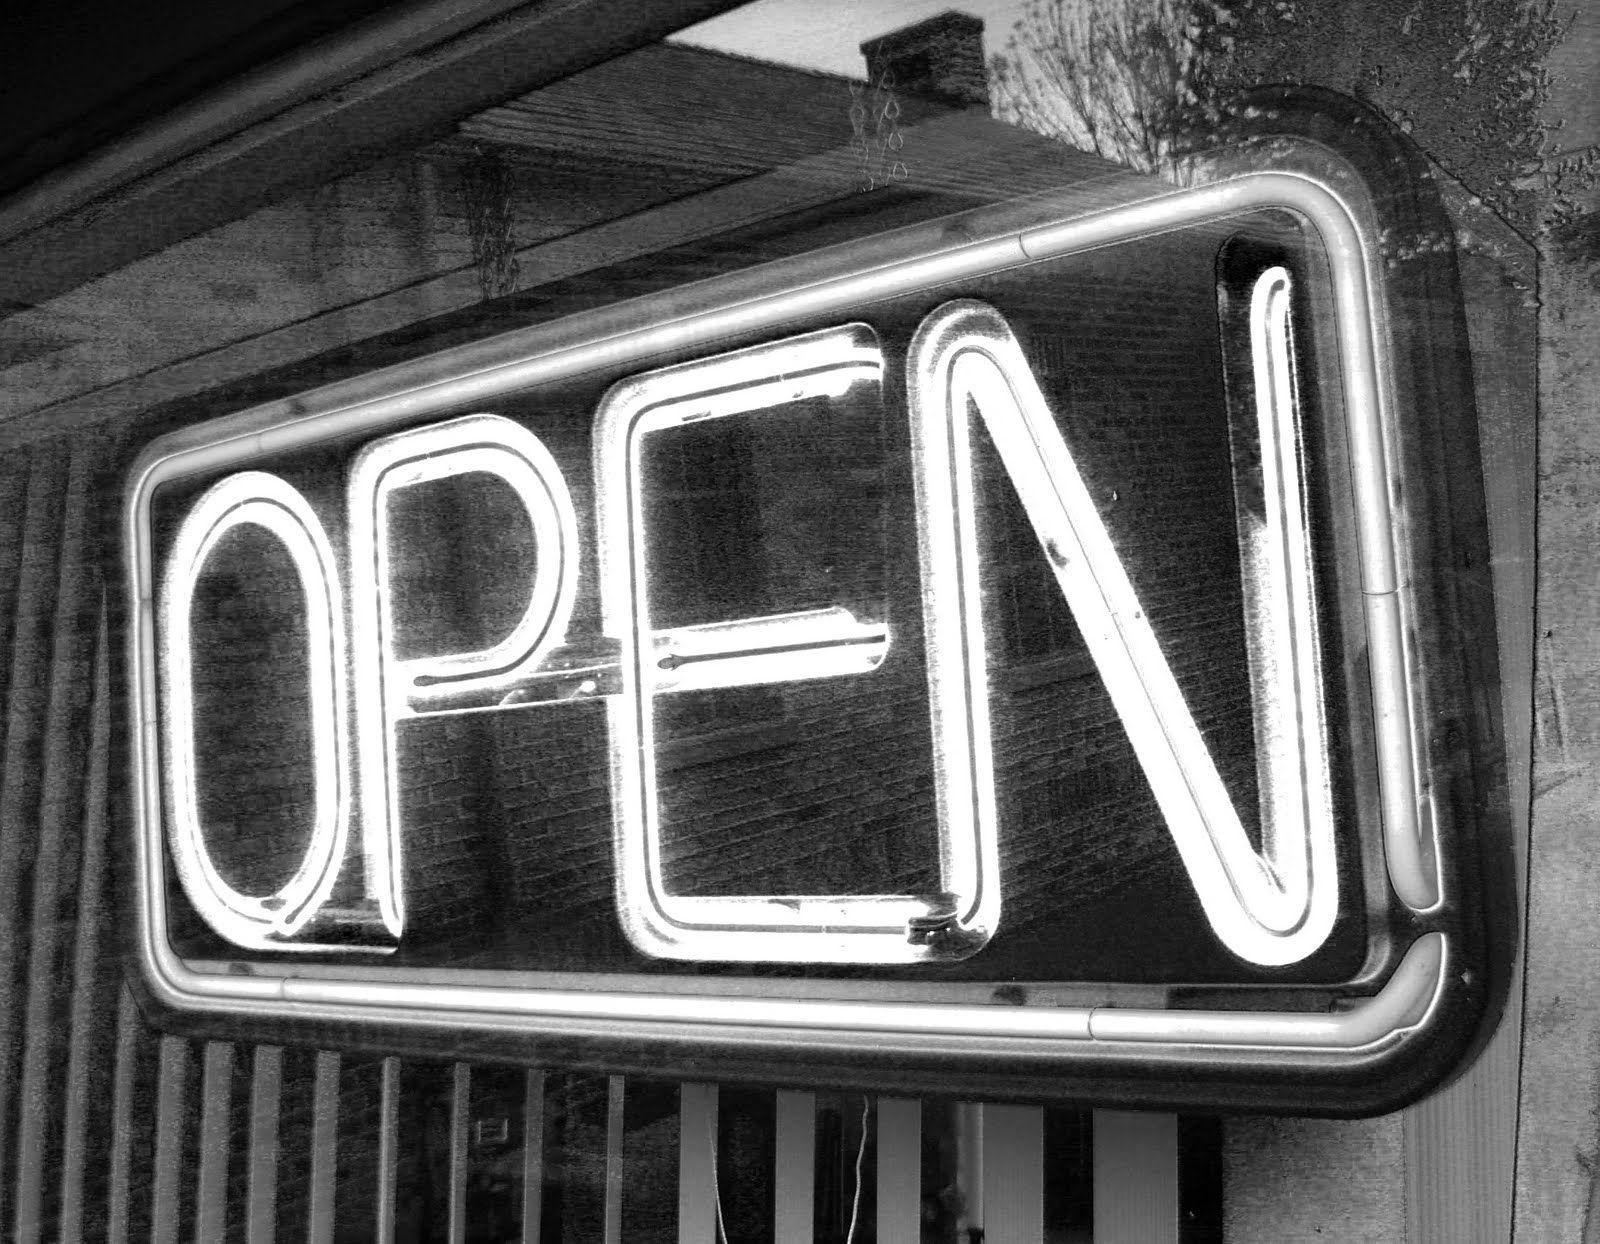 {whimsy lane} blog: so you're starting a handmade business...